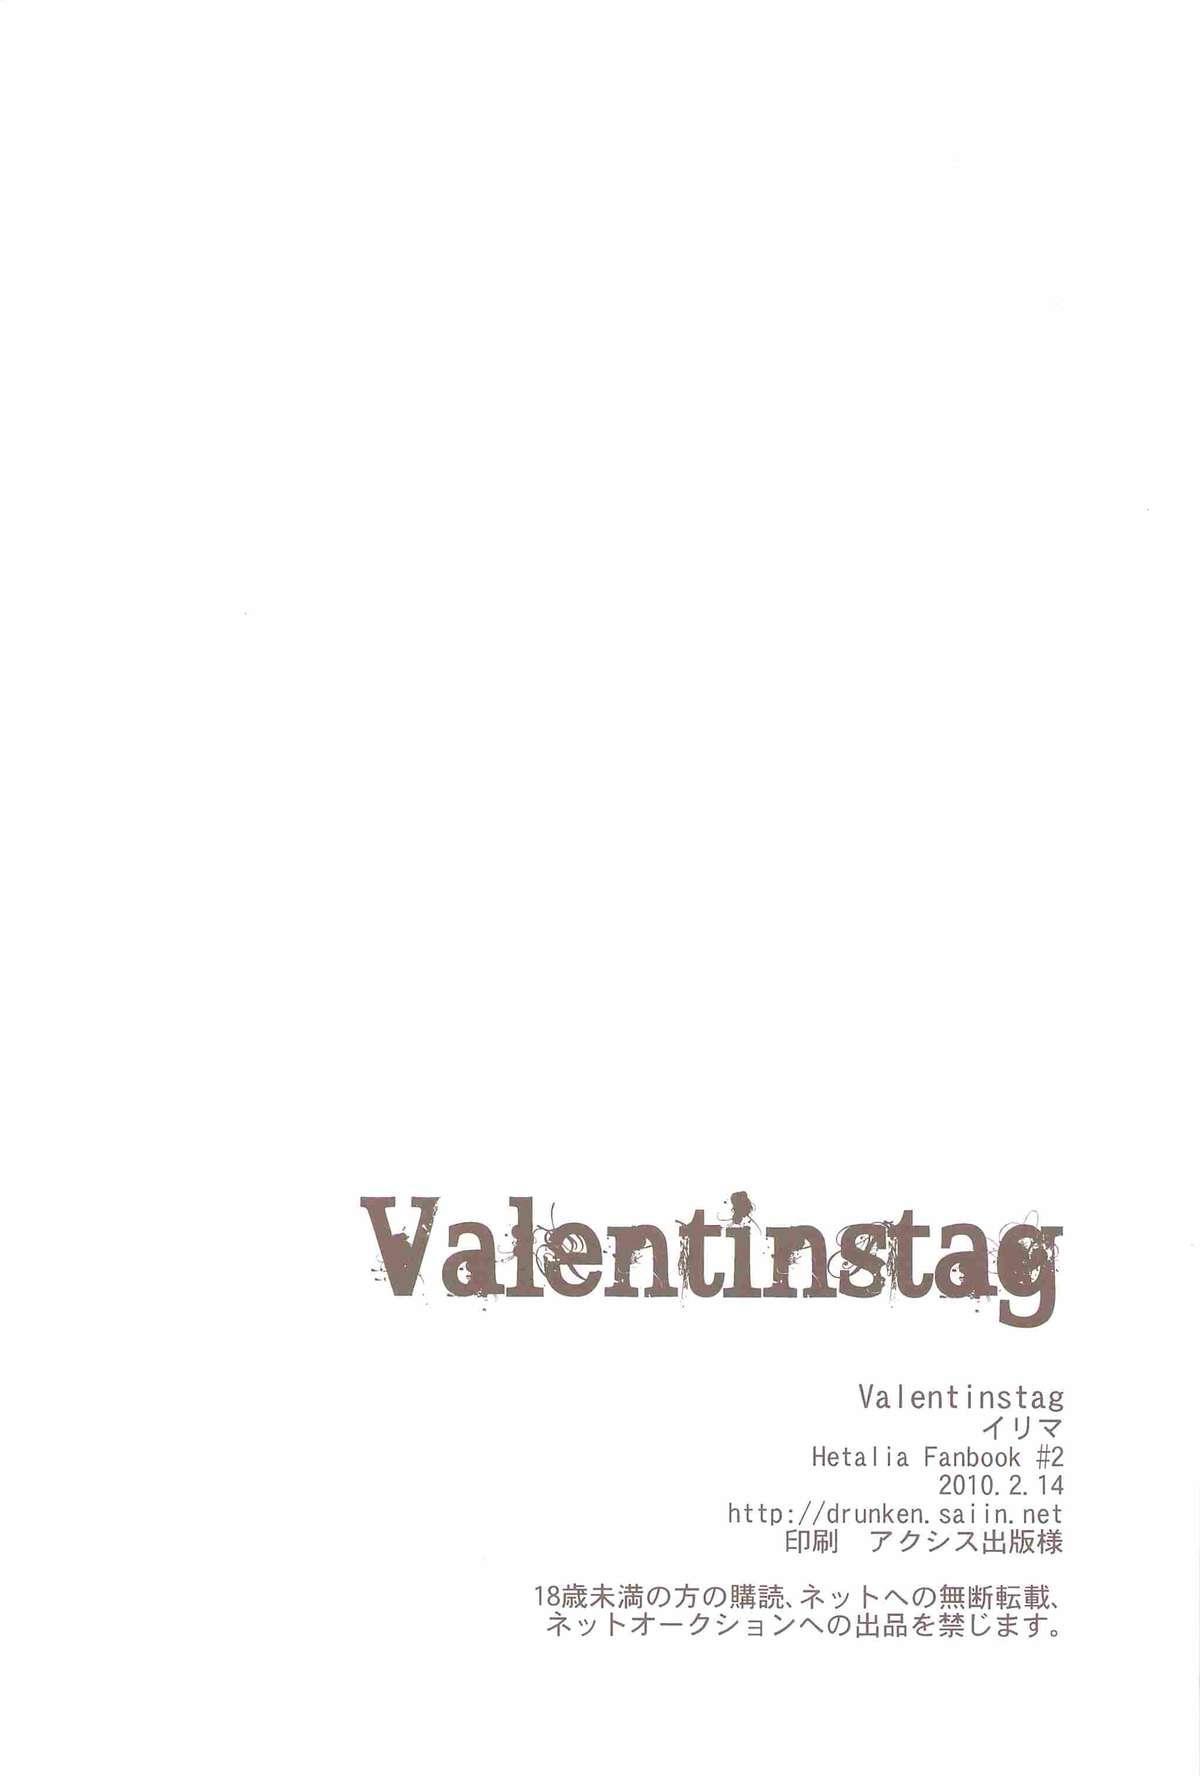 Valentinstag 24